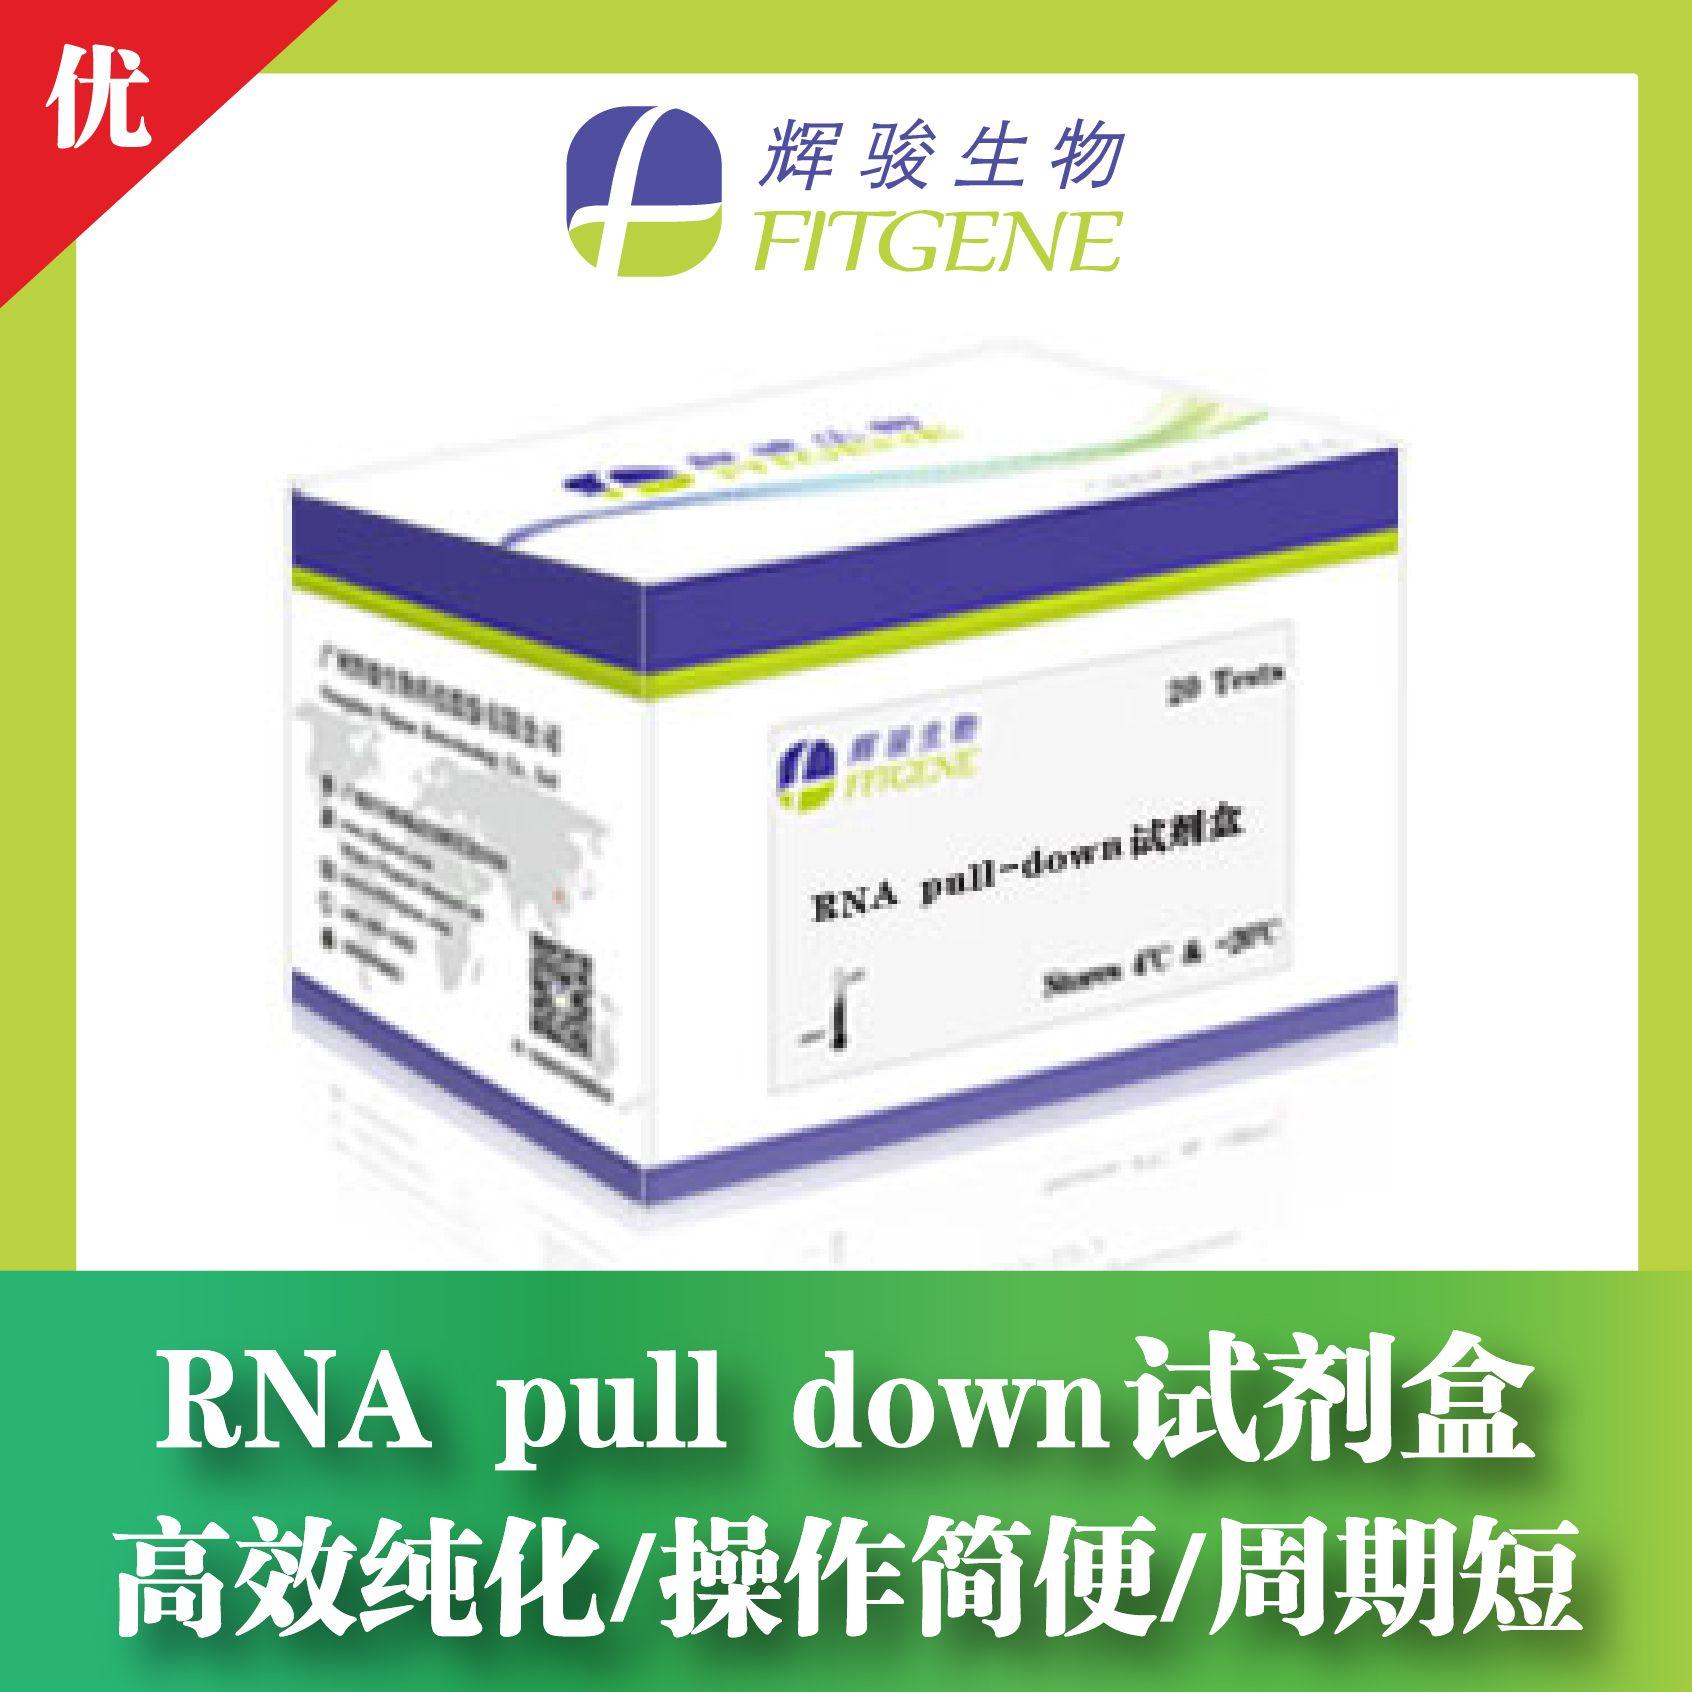 RNA pull down试剂盒—高效纯化 操作简便 周期短—辉骏生物